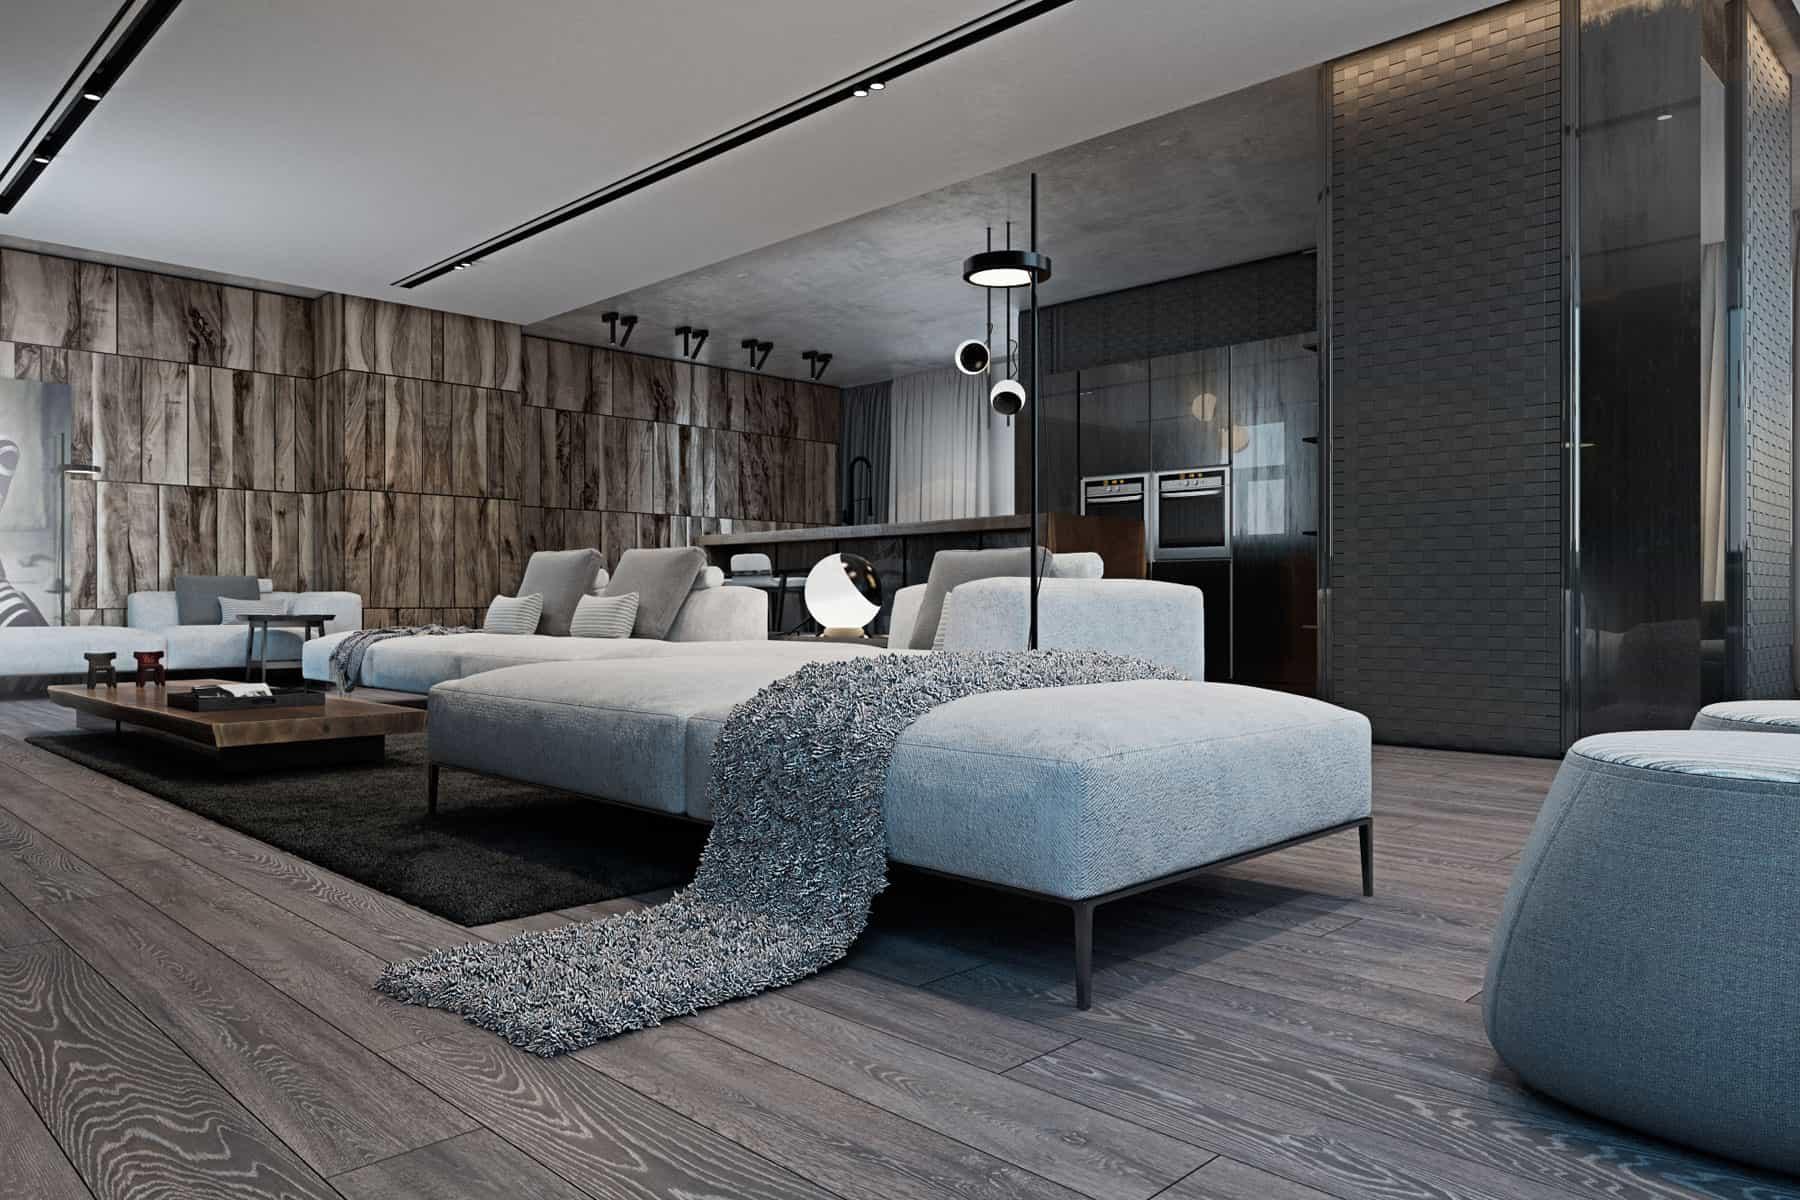 Iryna Dzhemesiuk Designs A Cozy Apartment In Kiev, Ukraine